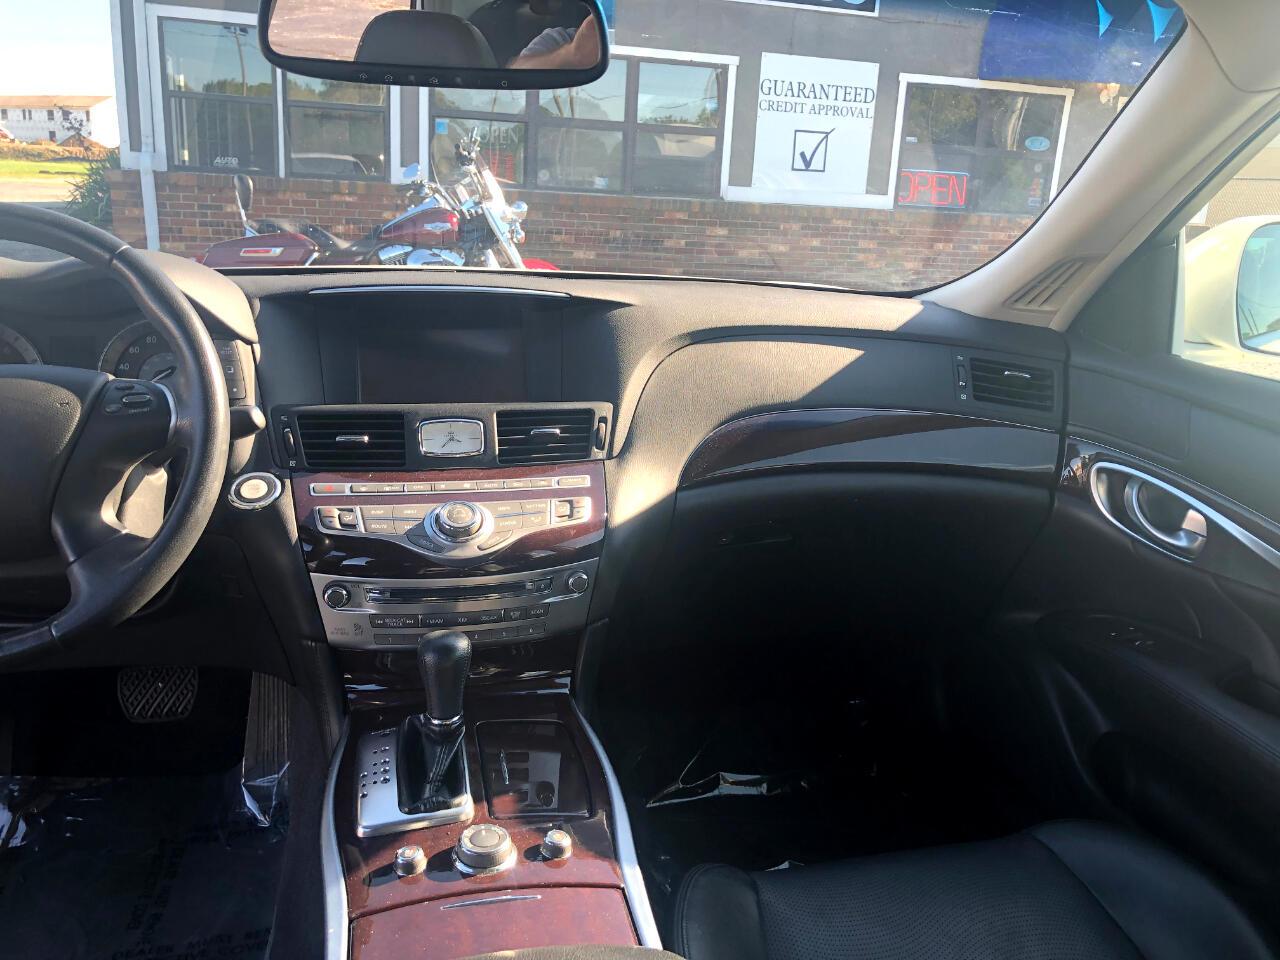 2014 Infiniti Q70 4dr Sdn V6 RWD